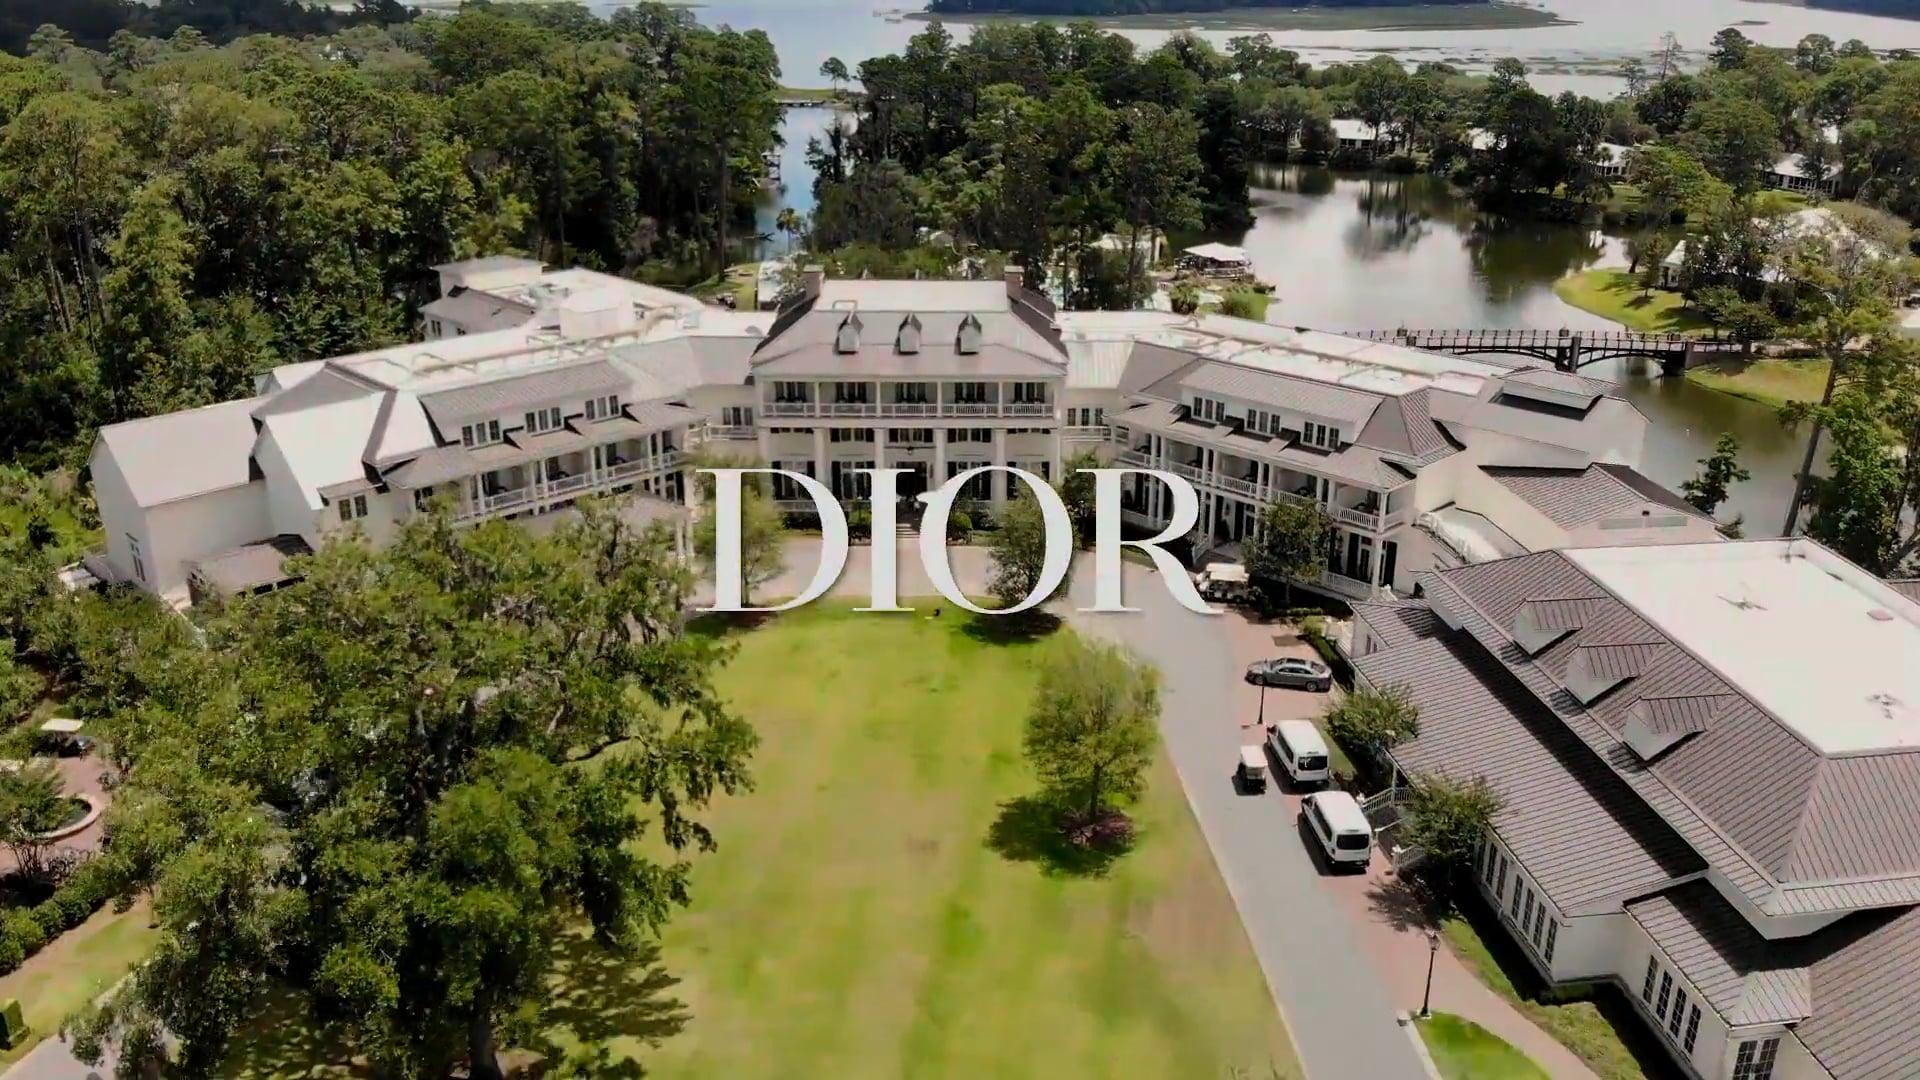 Dior NSM 2019